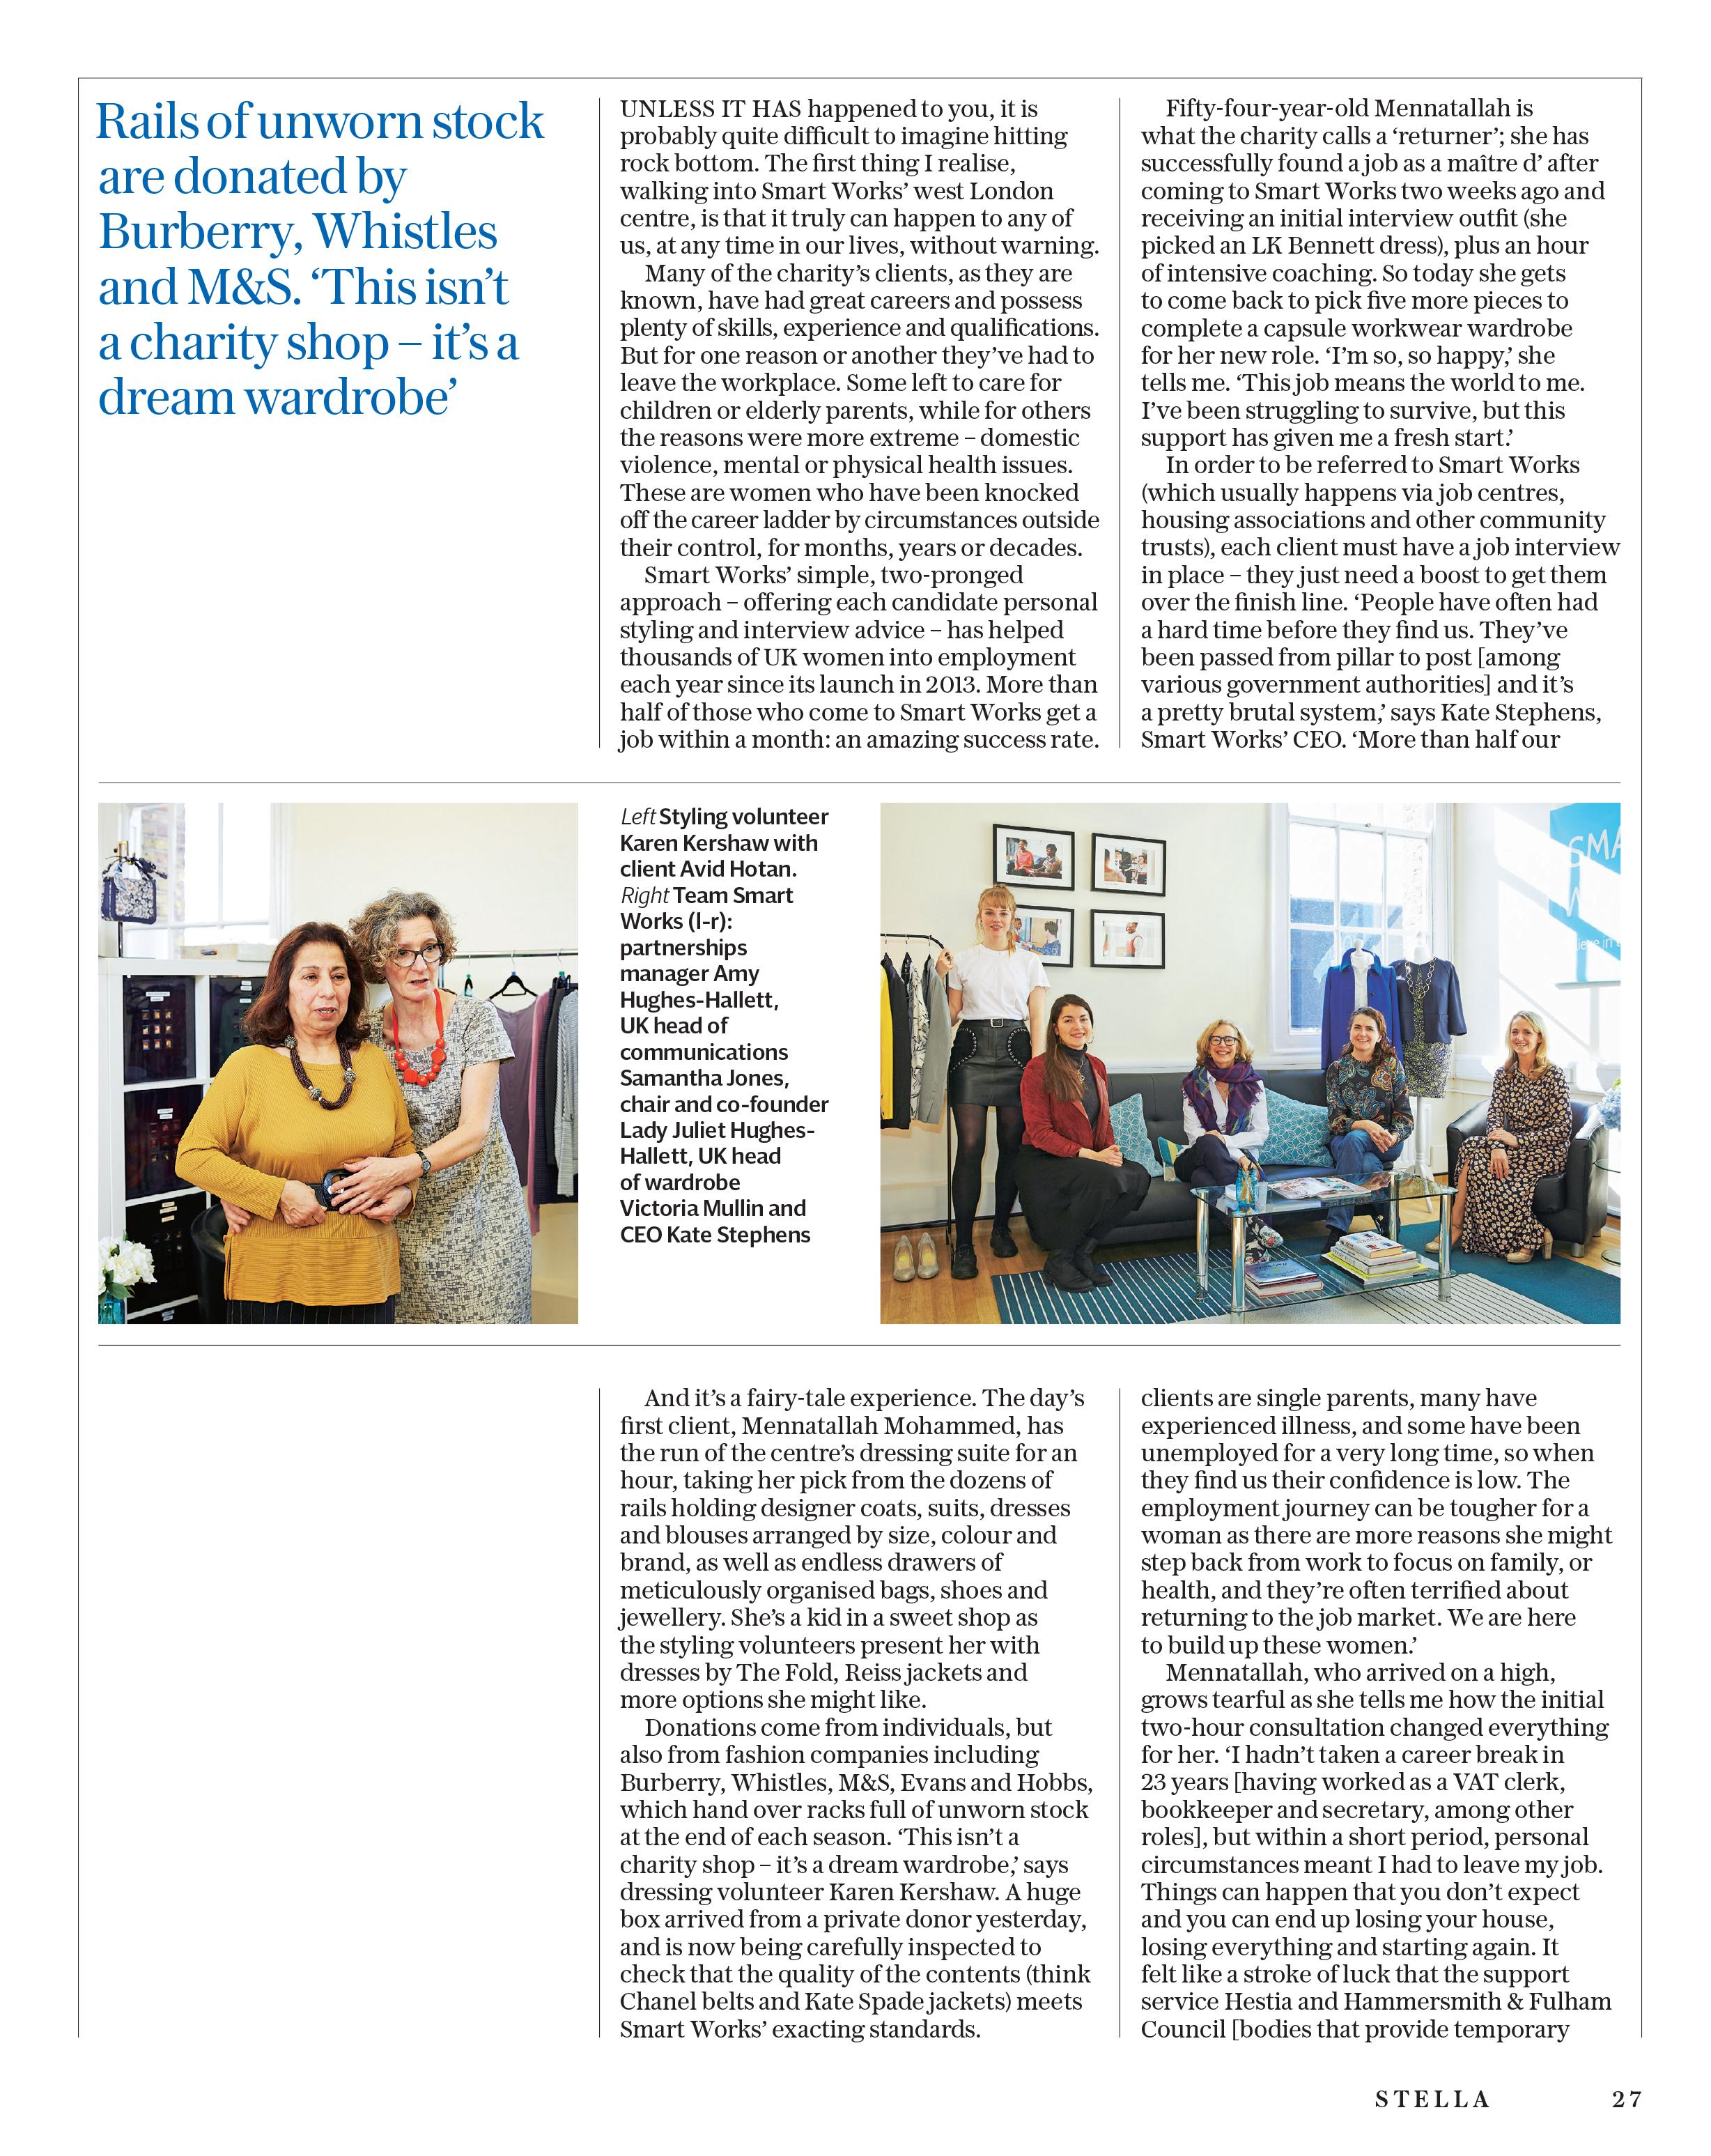 SMARTSunday Telegraph Magazine_06-05-2018_Main_1st_p27